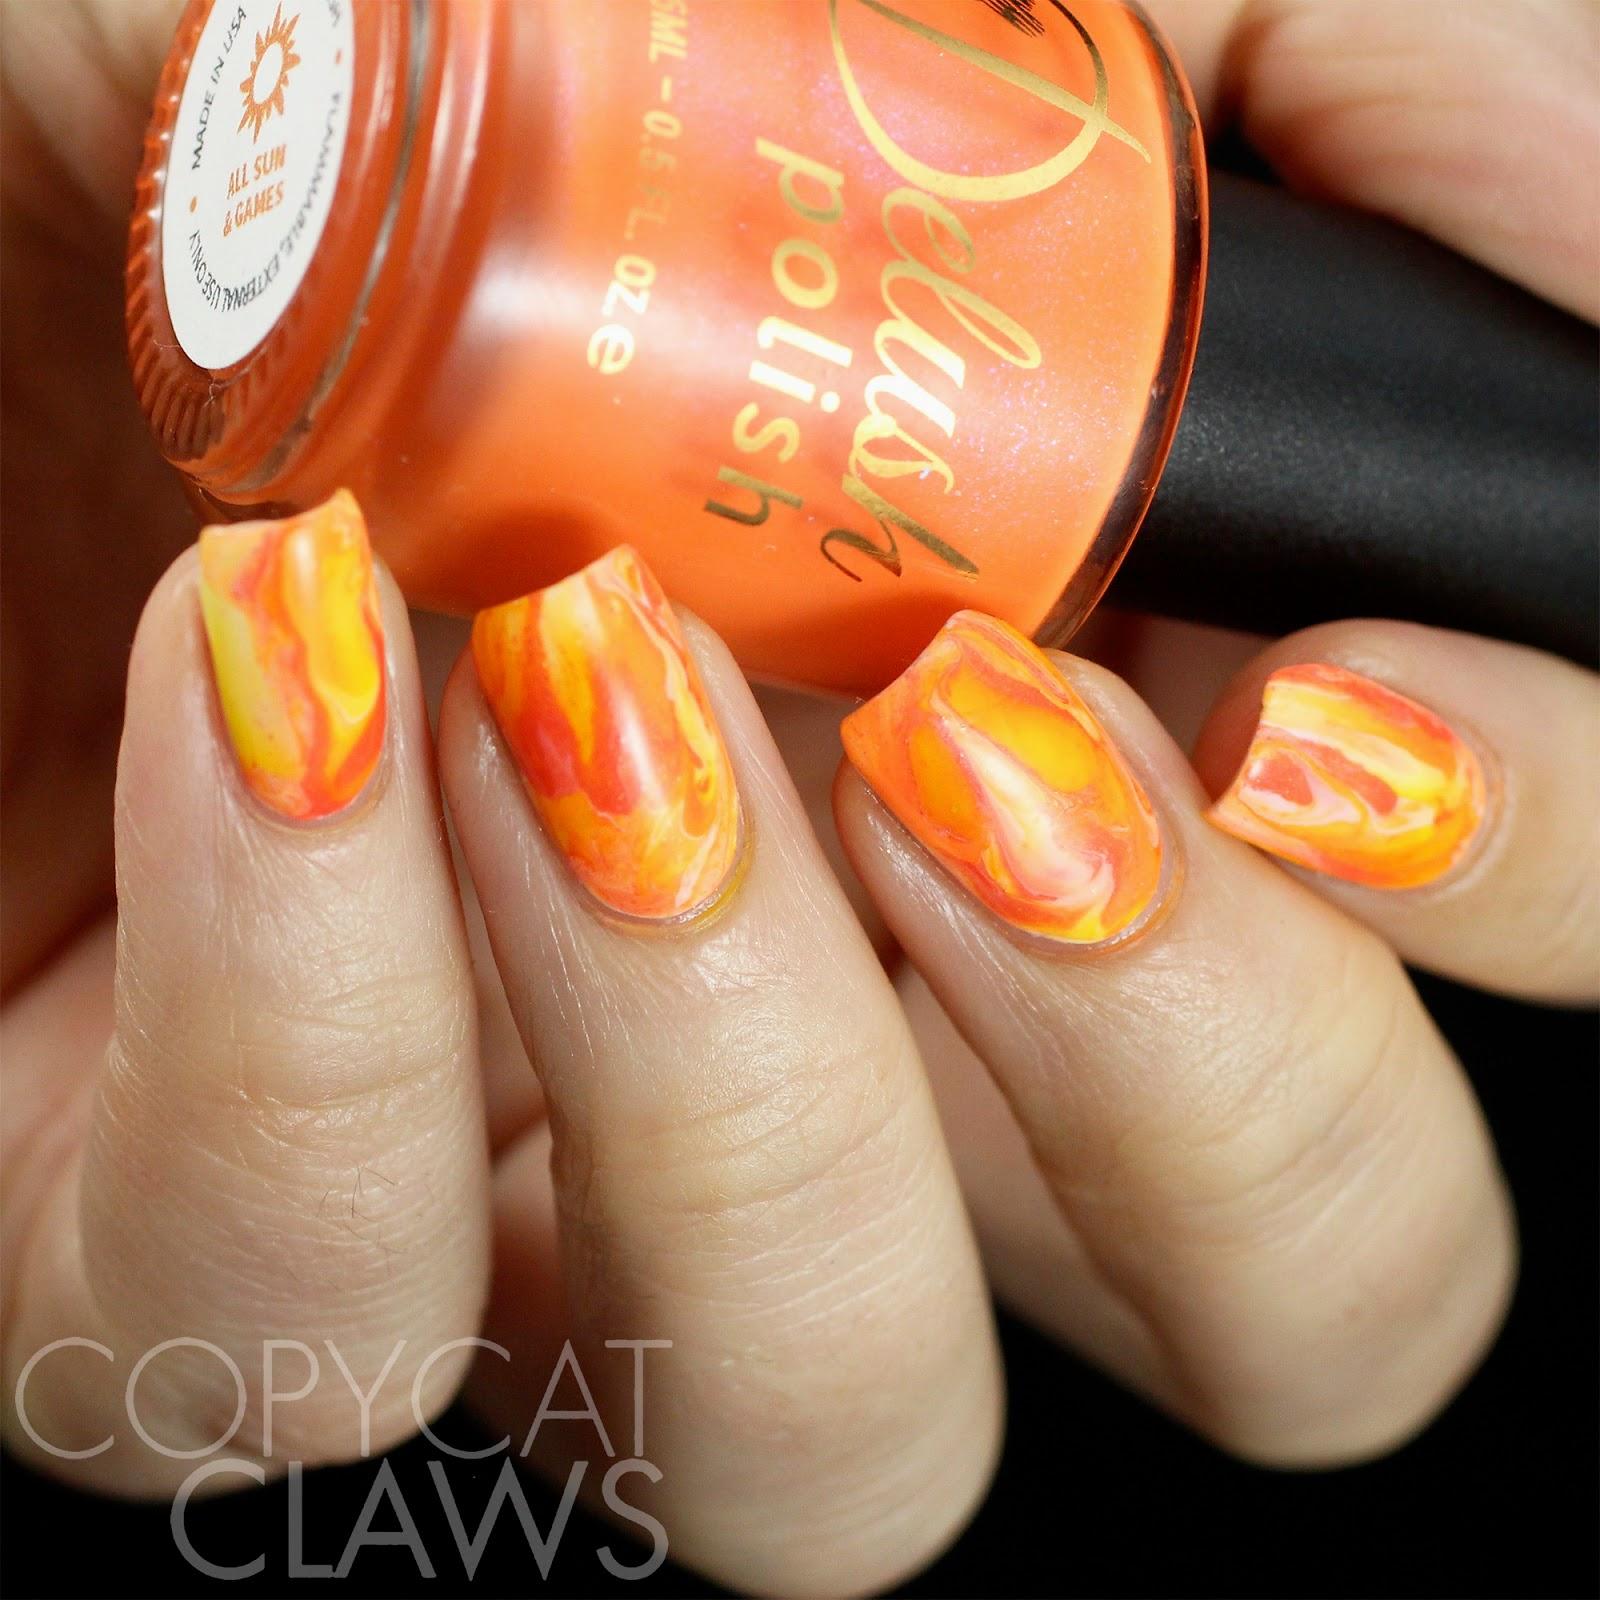 Copycat Claws 26 Great Nail Art Ideas Sunshine